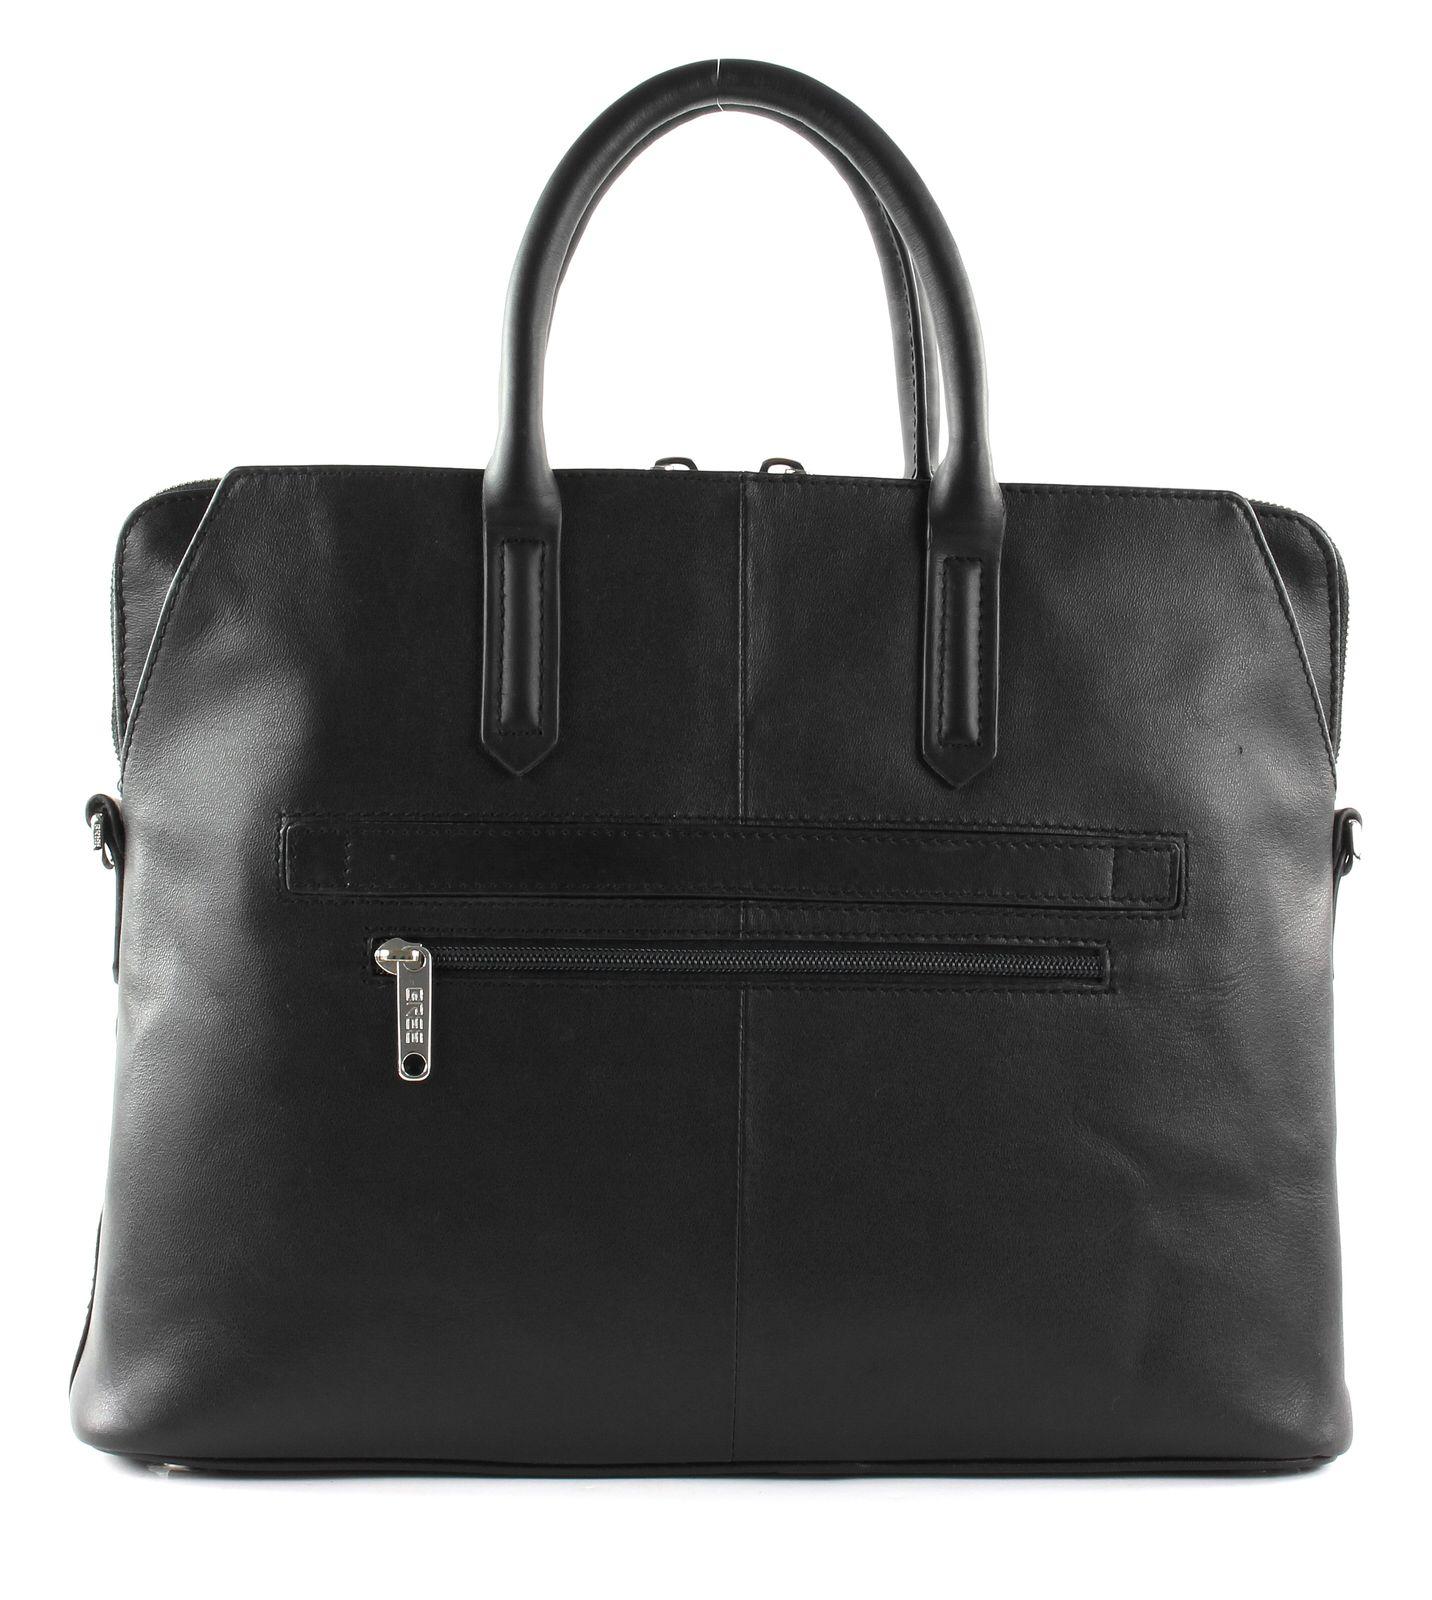 Cheris 32 Sets Handtaschen-F/ü/ße Nagelkopf flache Nieten Metallkegel Nieten f/ür Lederhandwerk Schraubverschluss 3 Farben